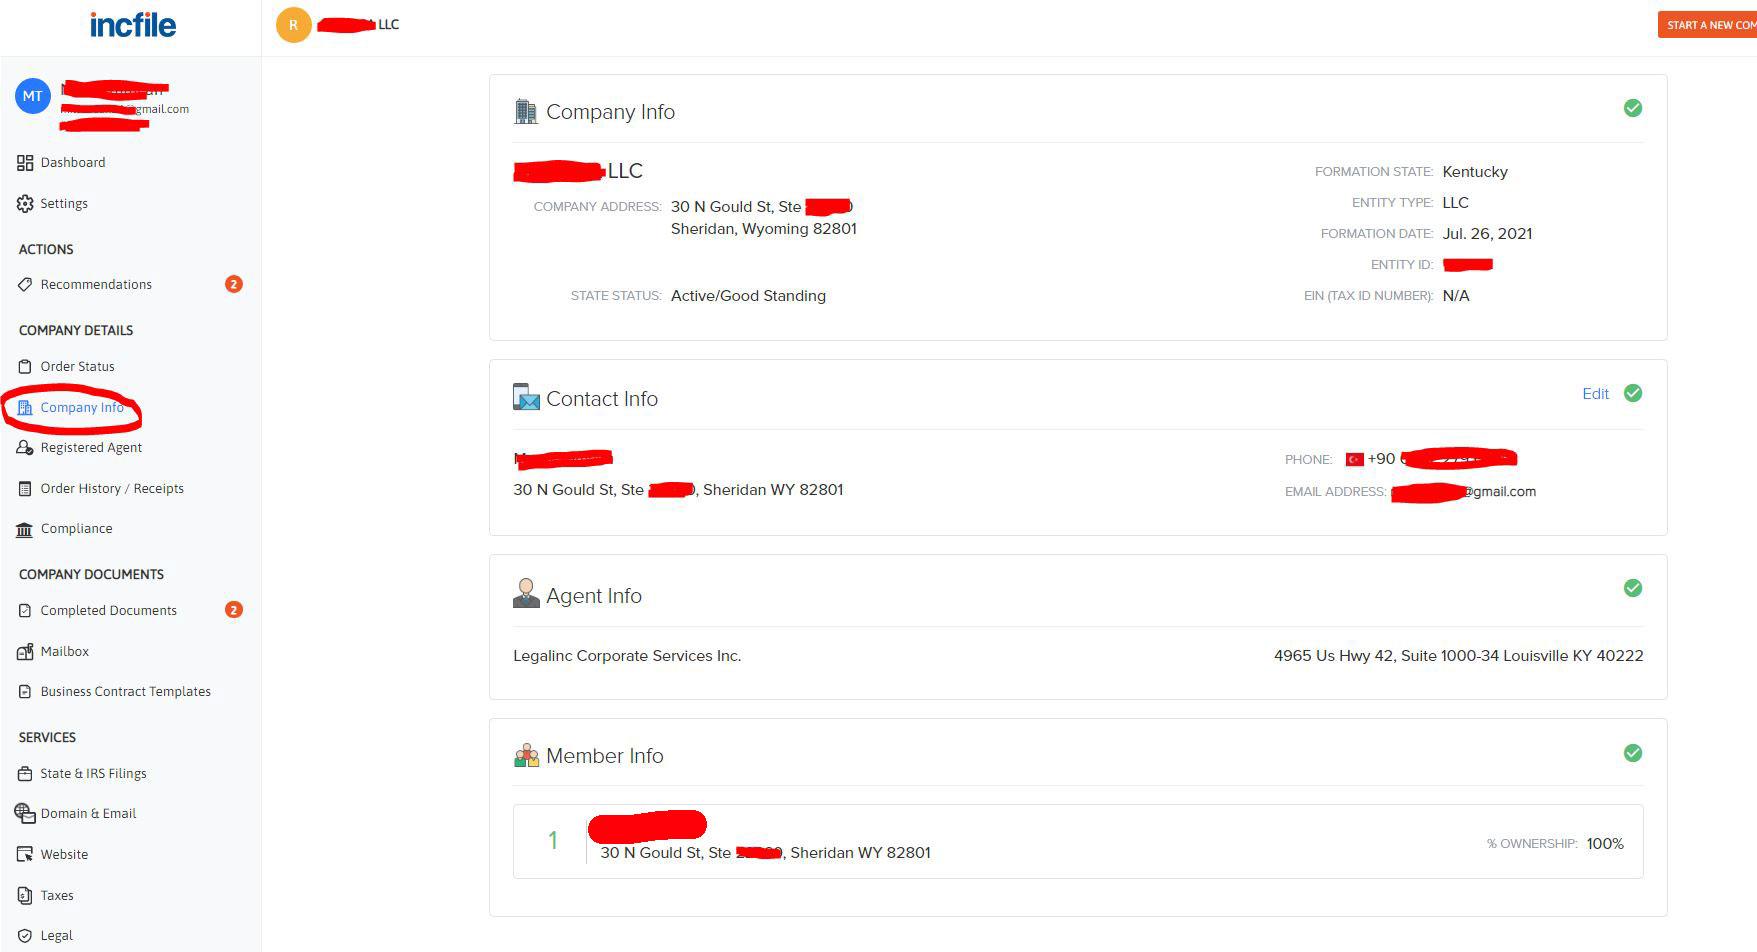 incfile kentucky sirket kurulmus panel 1 Incfile Müşteri Paneli